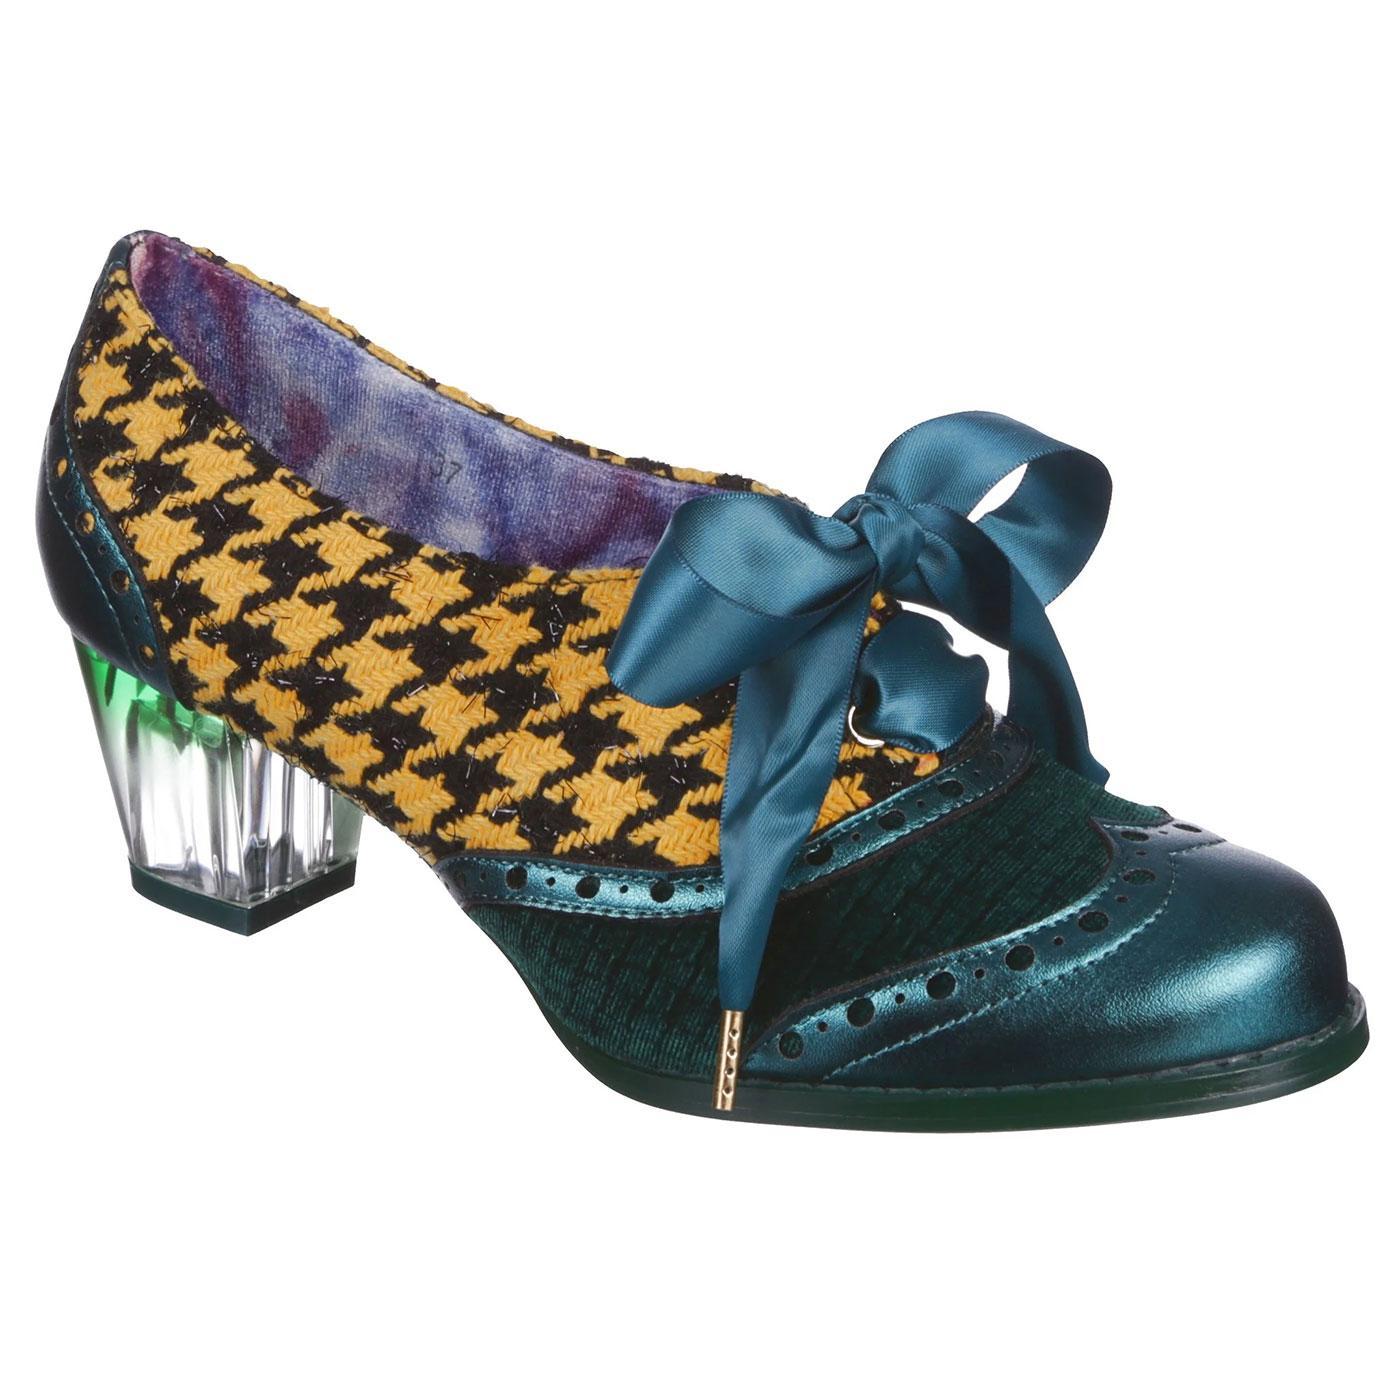 Corporate Beauty IRREGULAR CHOICE Retro Heels B/Y